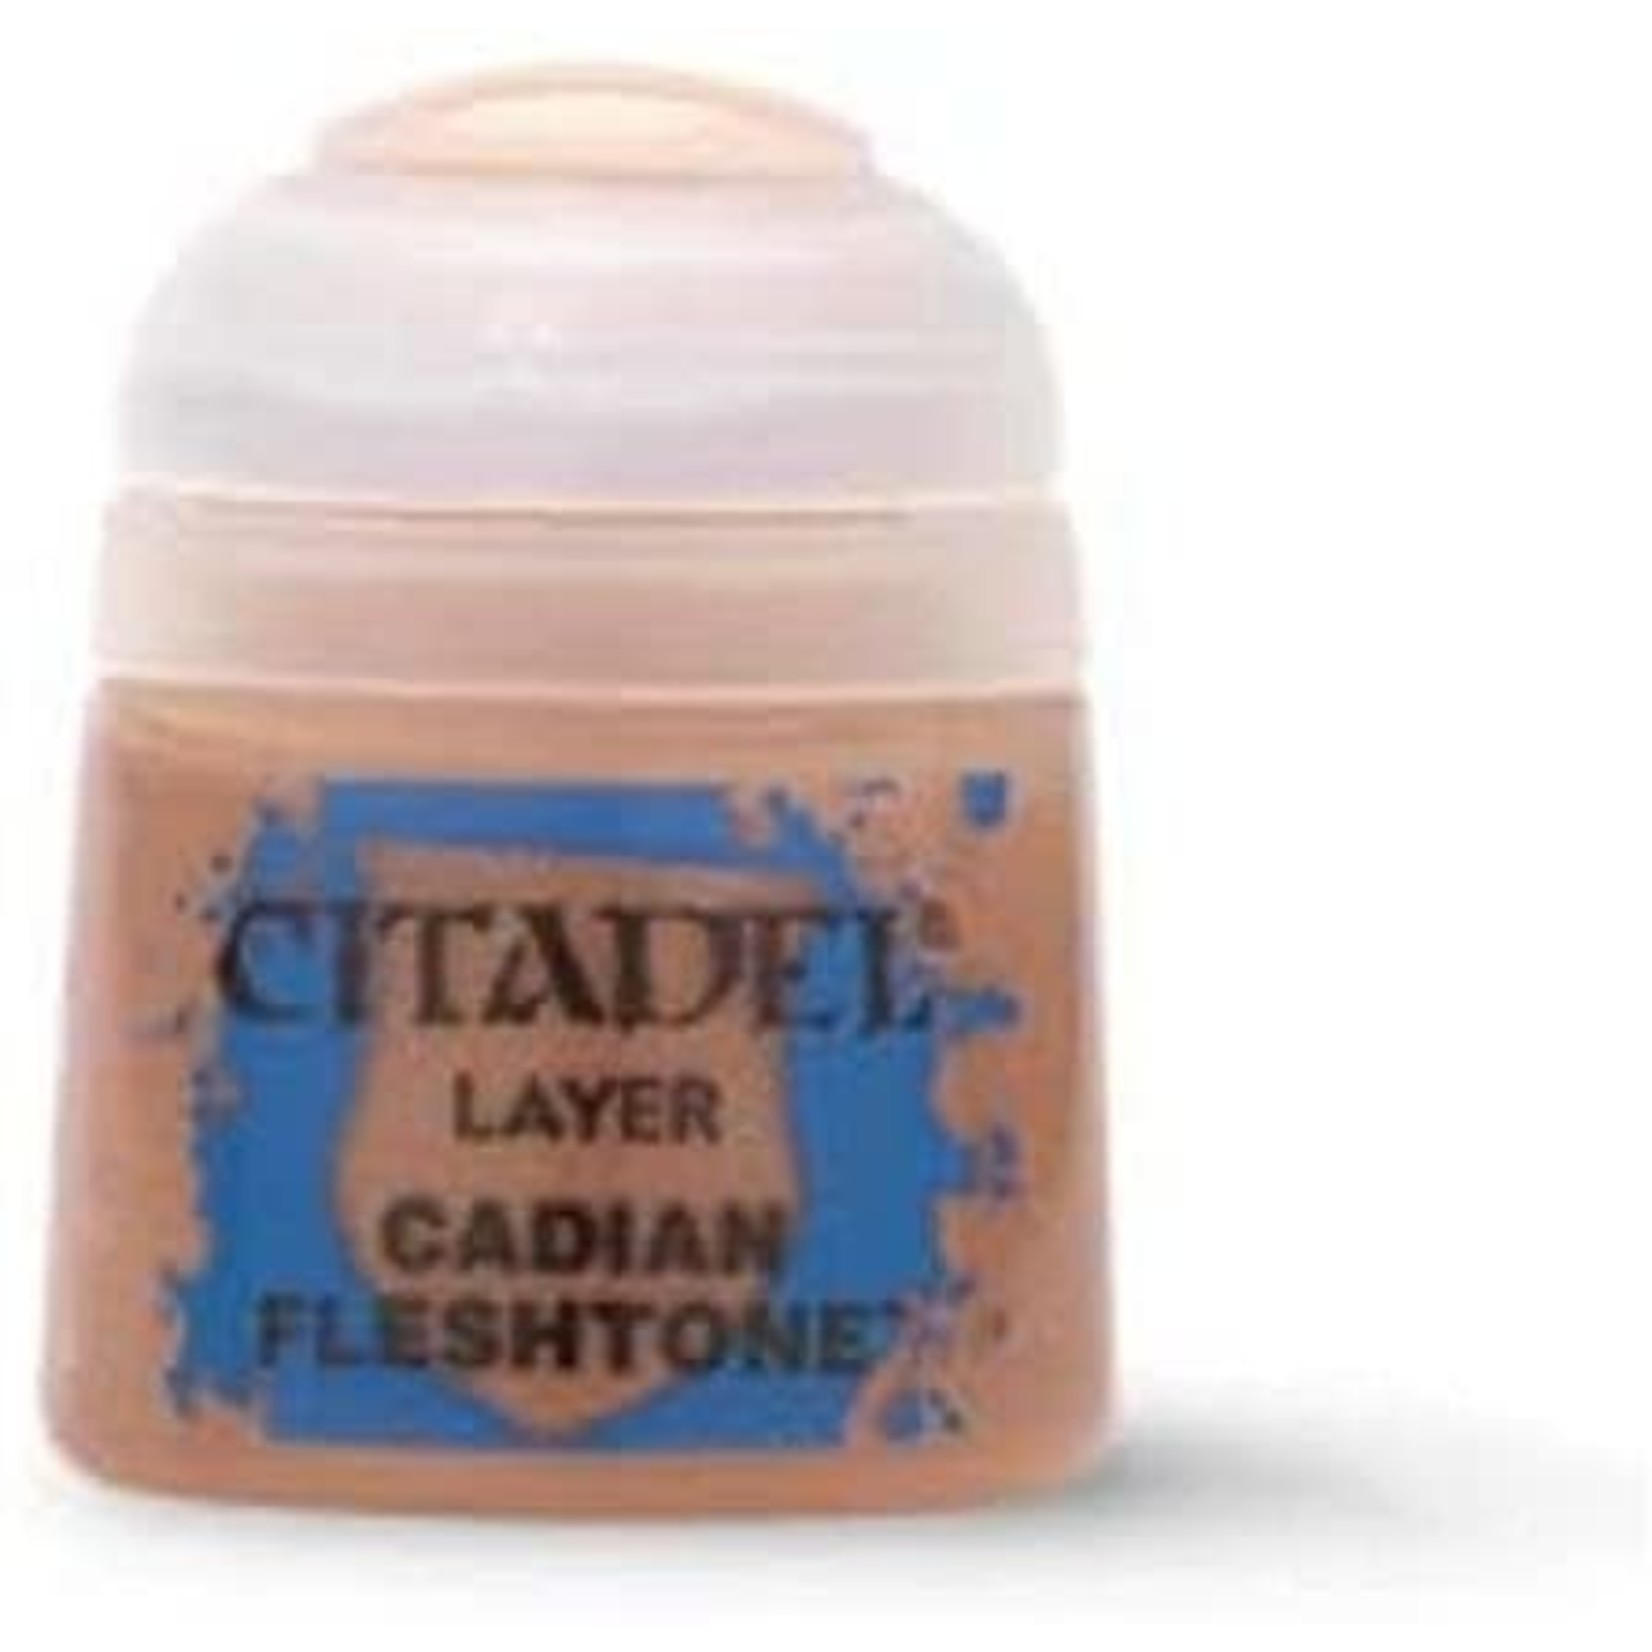 Games Workshop Citadel Paint: Cadian Fleshtone 12ml